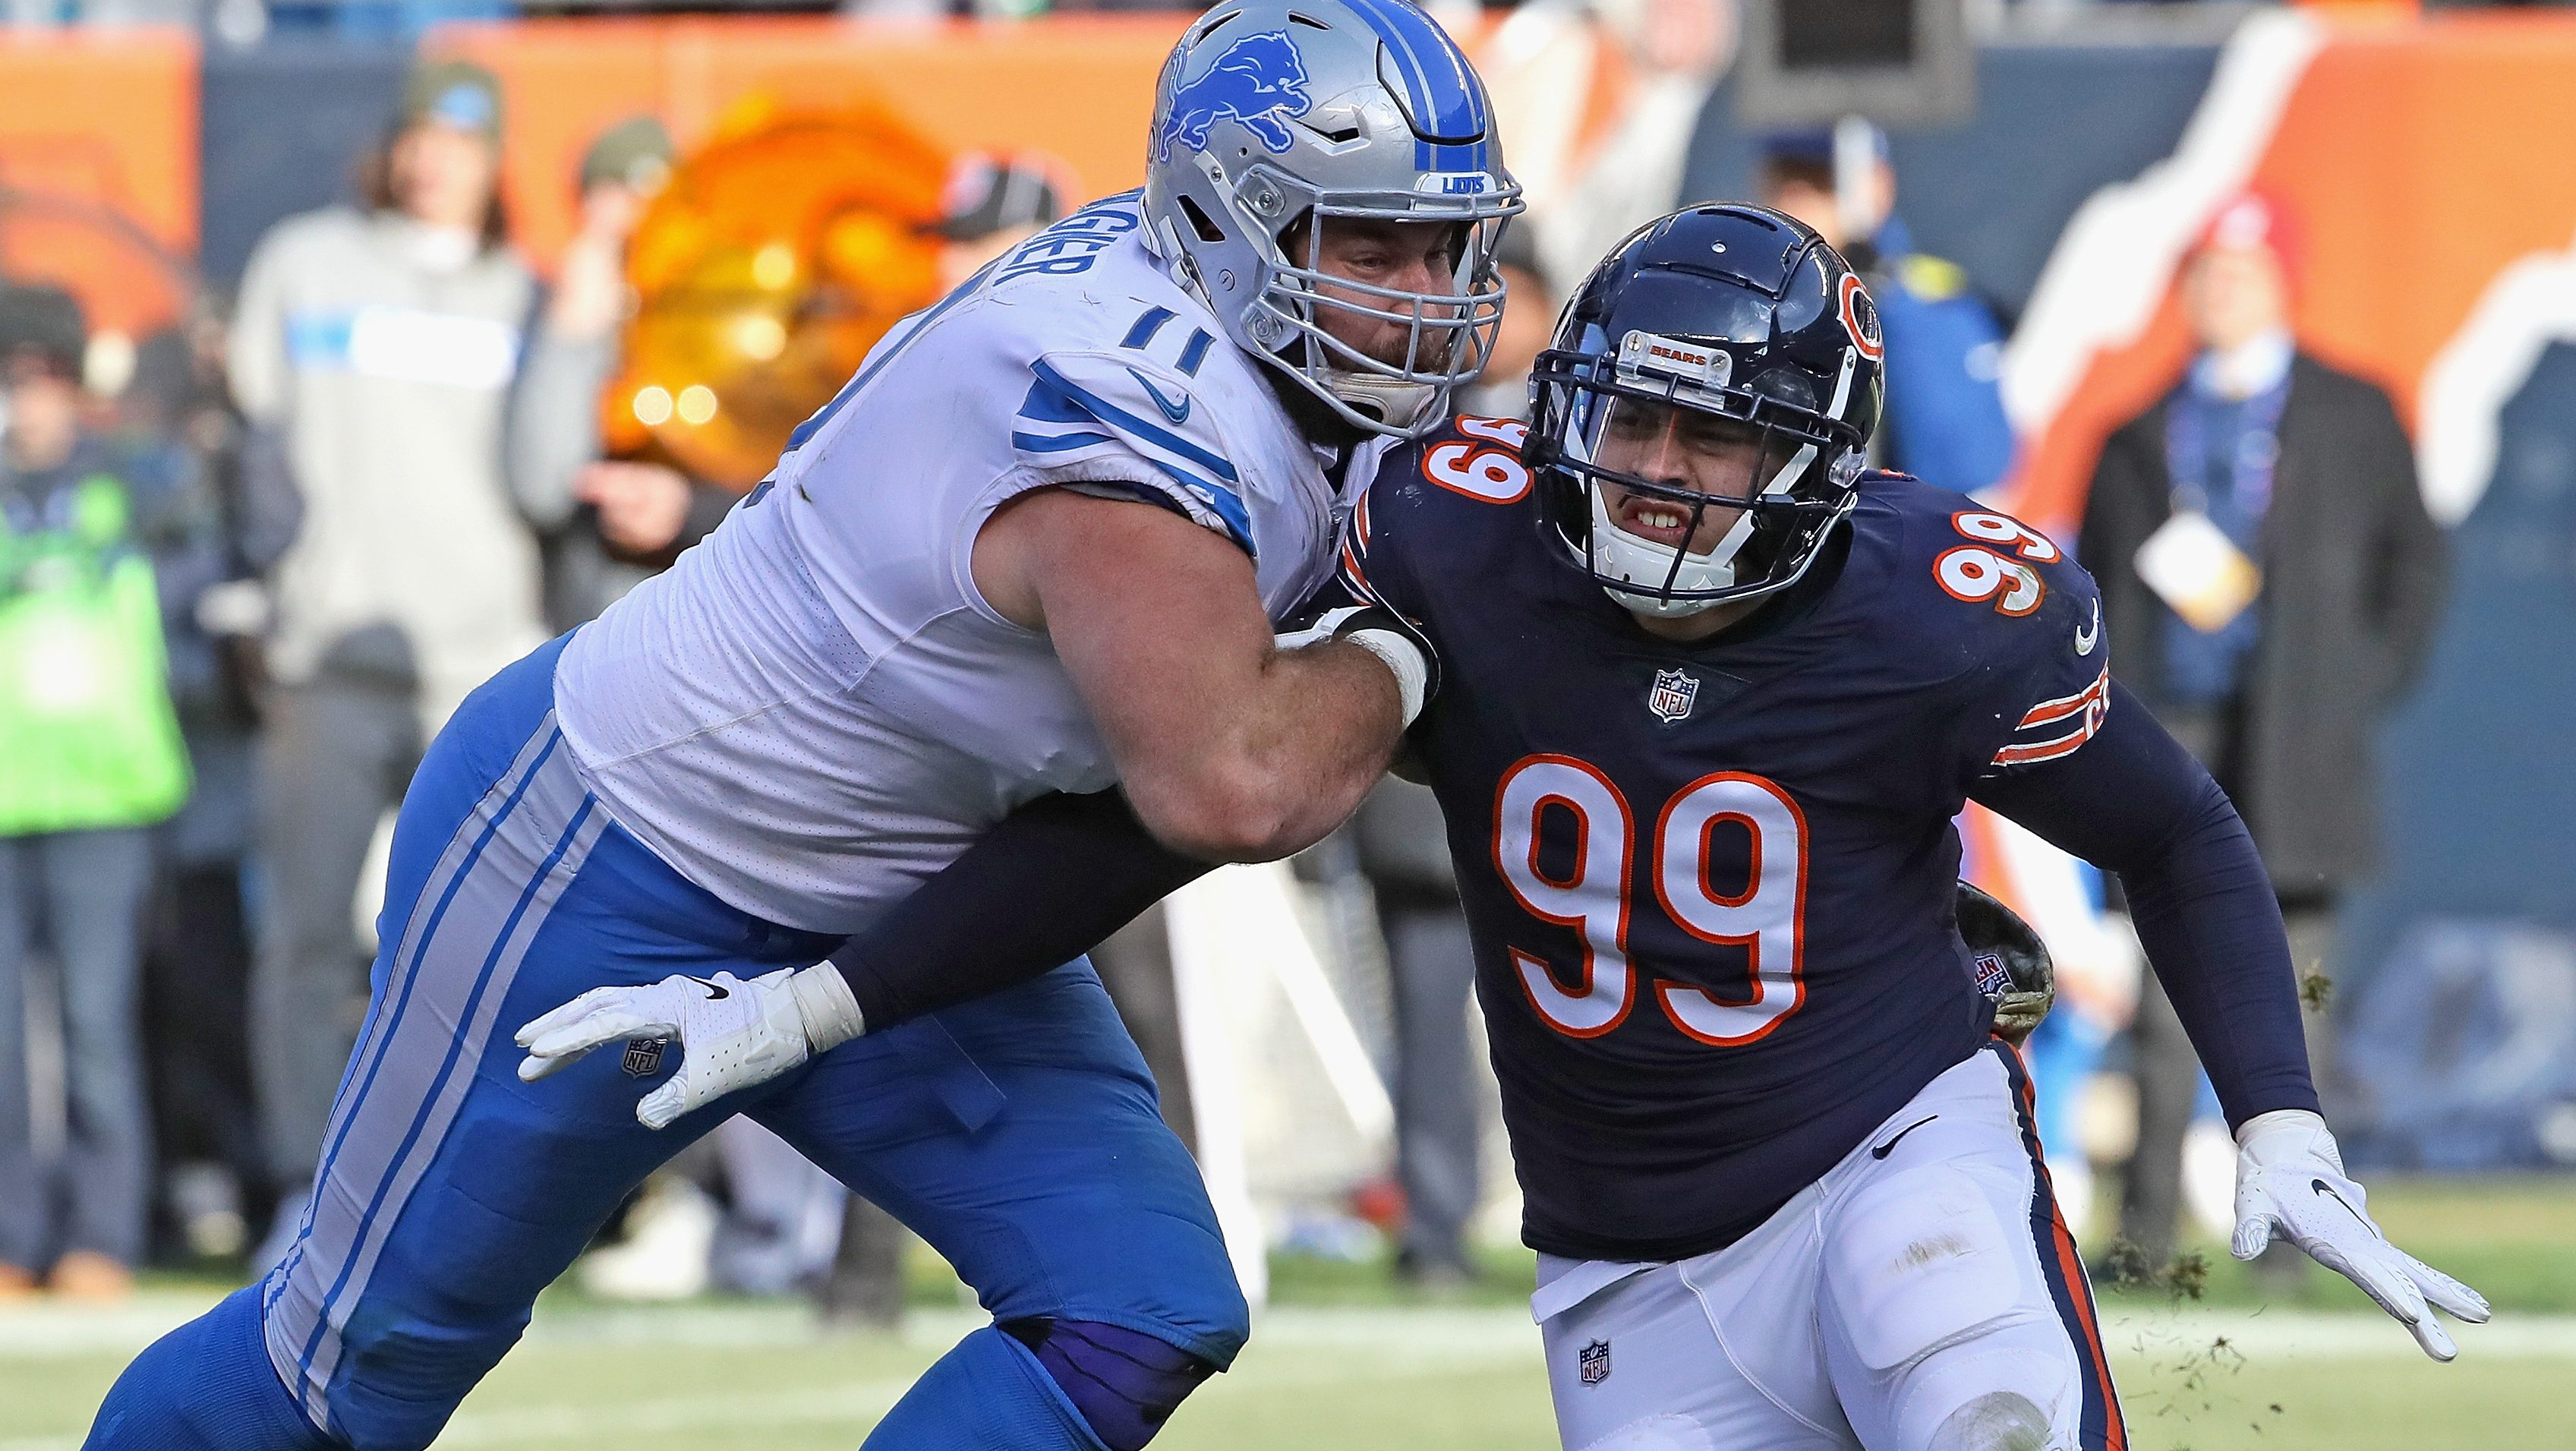 Ex-Bears LB Un-Retires, Returns to NFL: Report